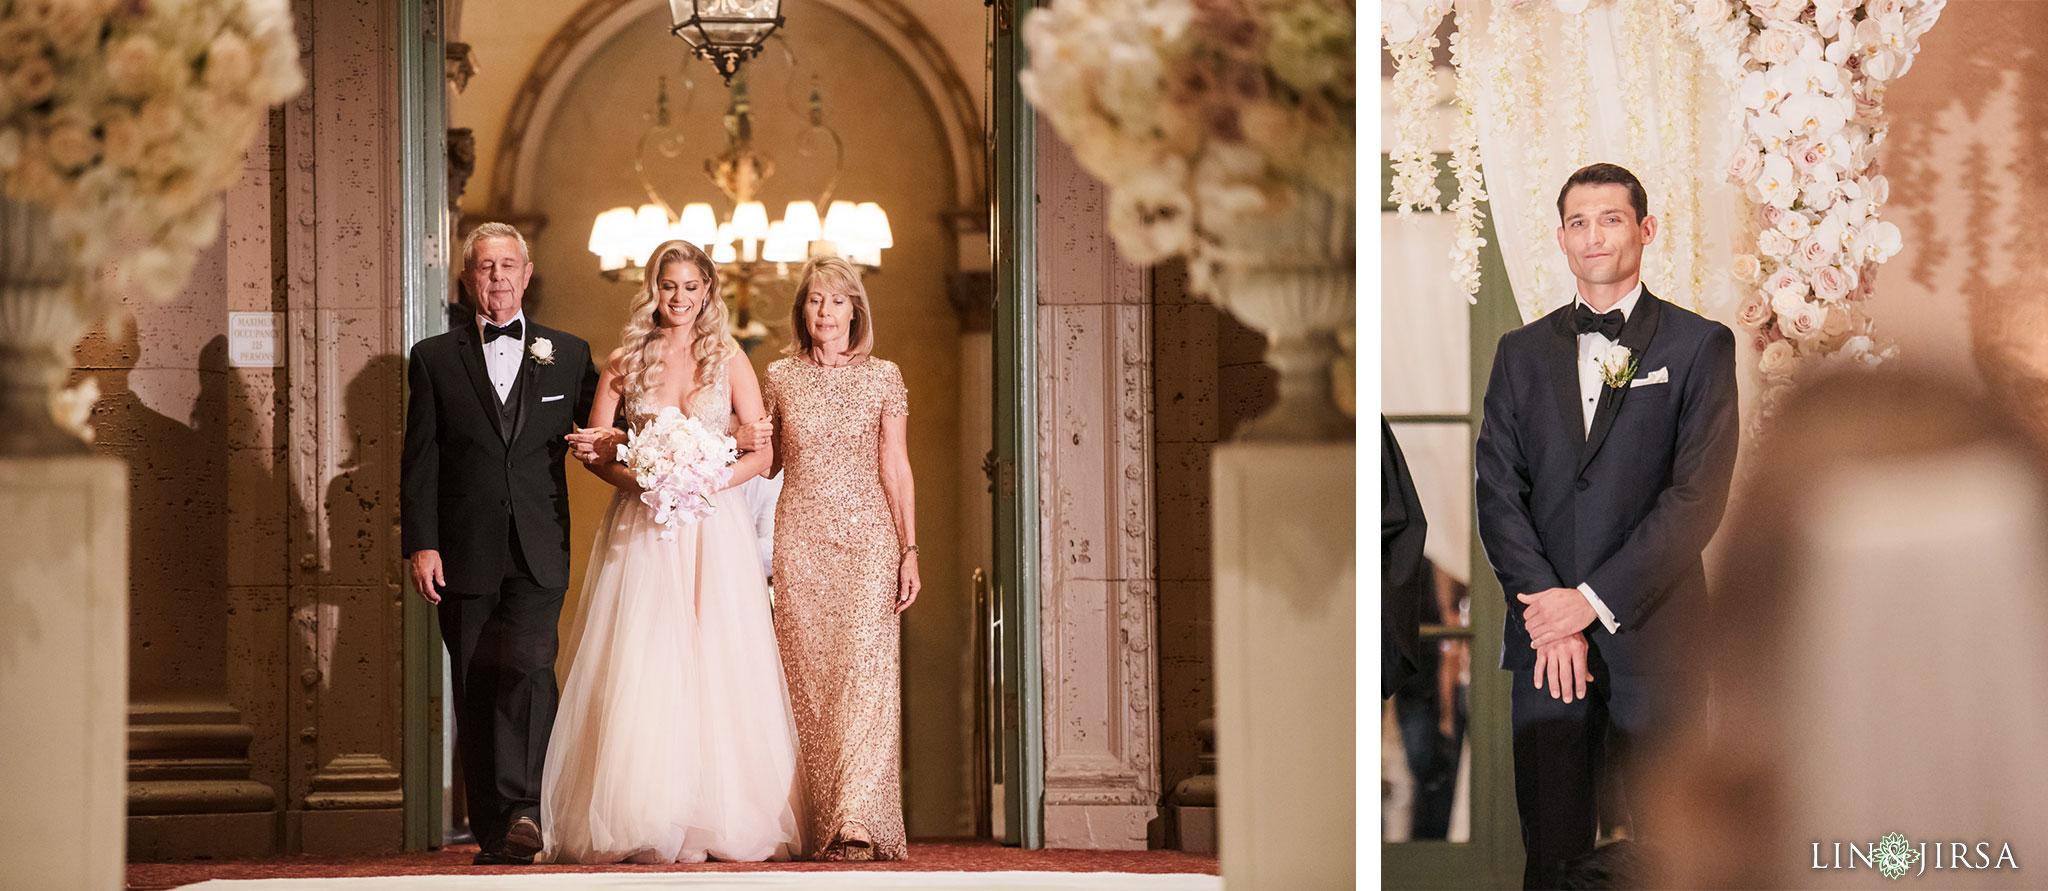 011 millennium biltmore hotel los angeles wedding photography